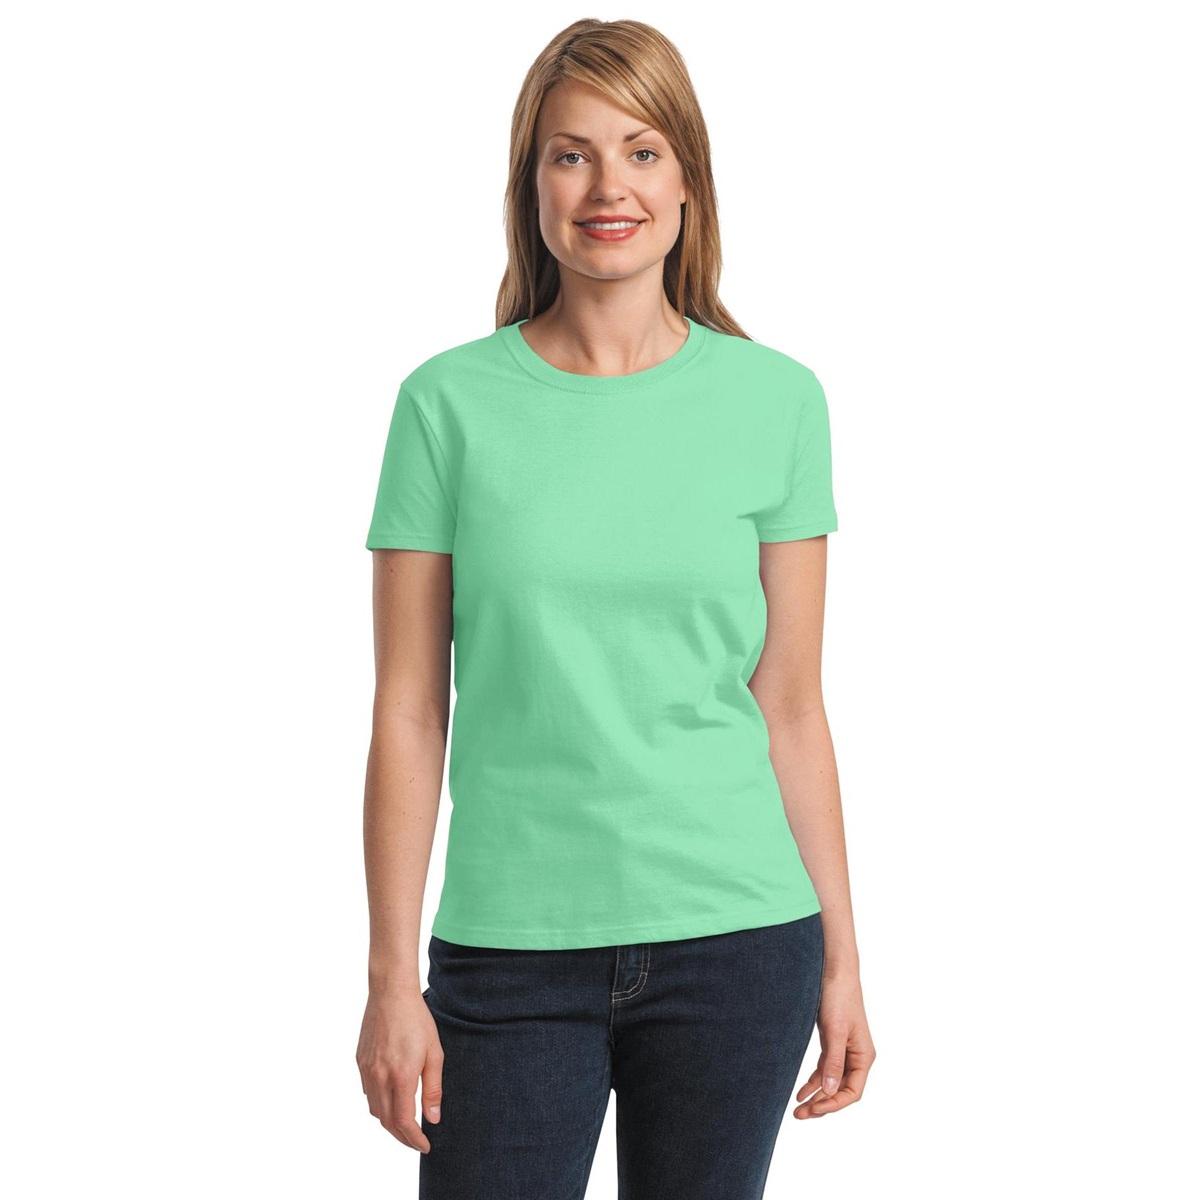 Gildan 2000l women 39 s ultra cotton t shirt mint green for Mint color t shirt